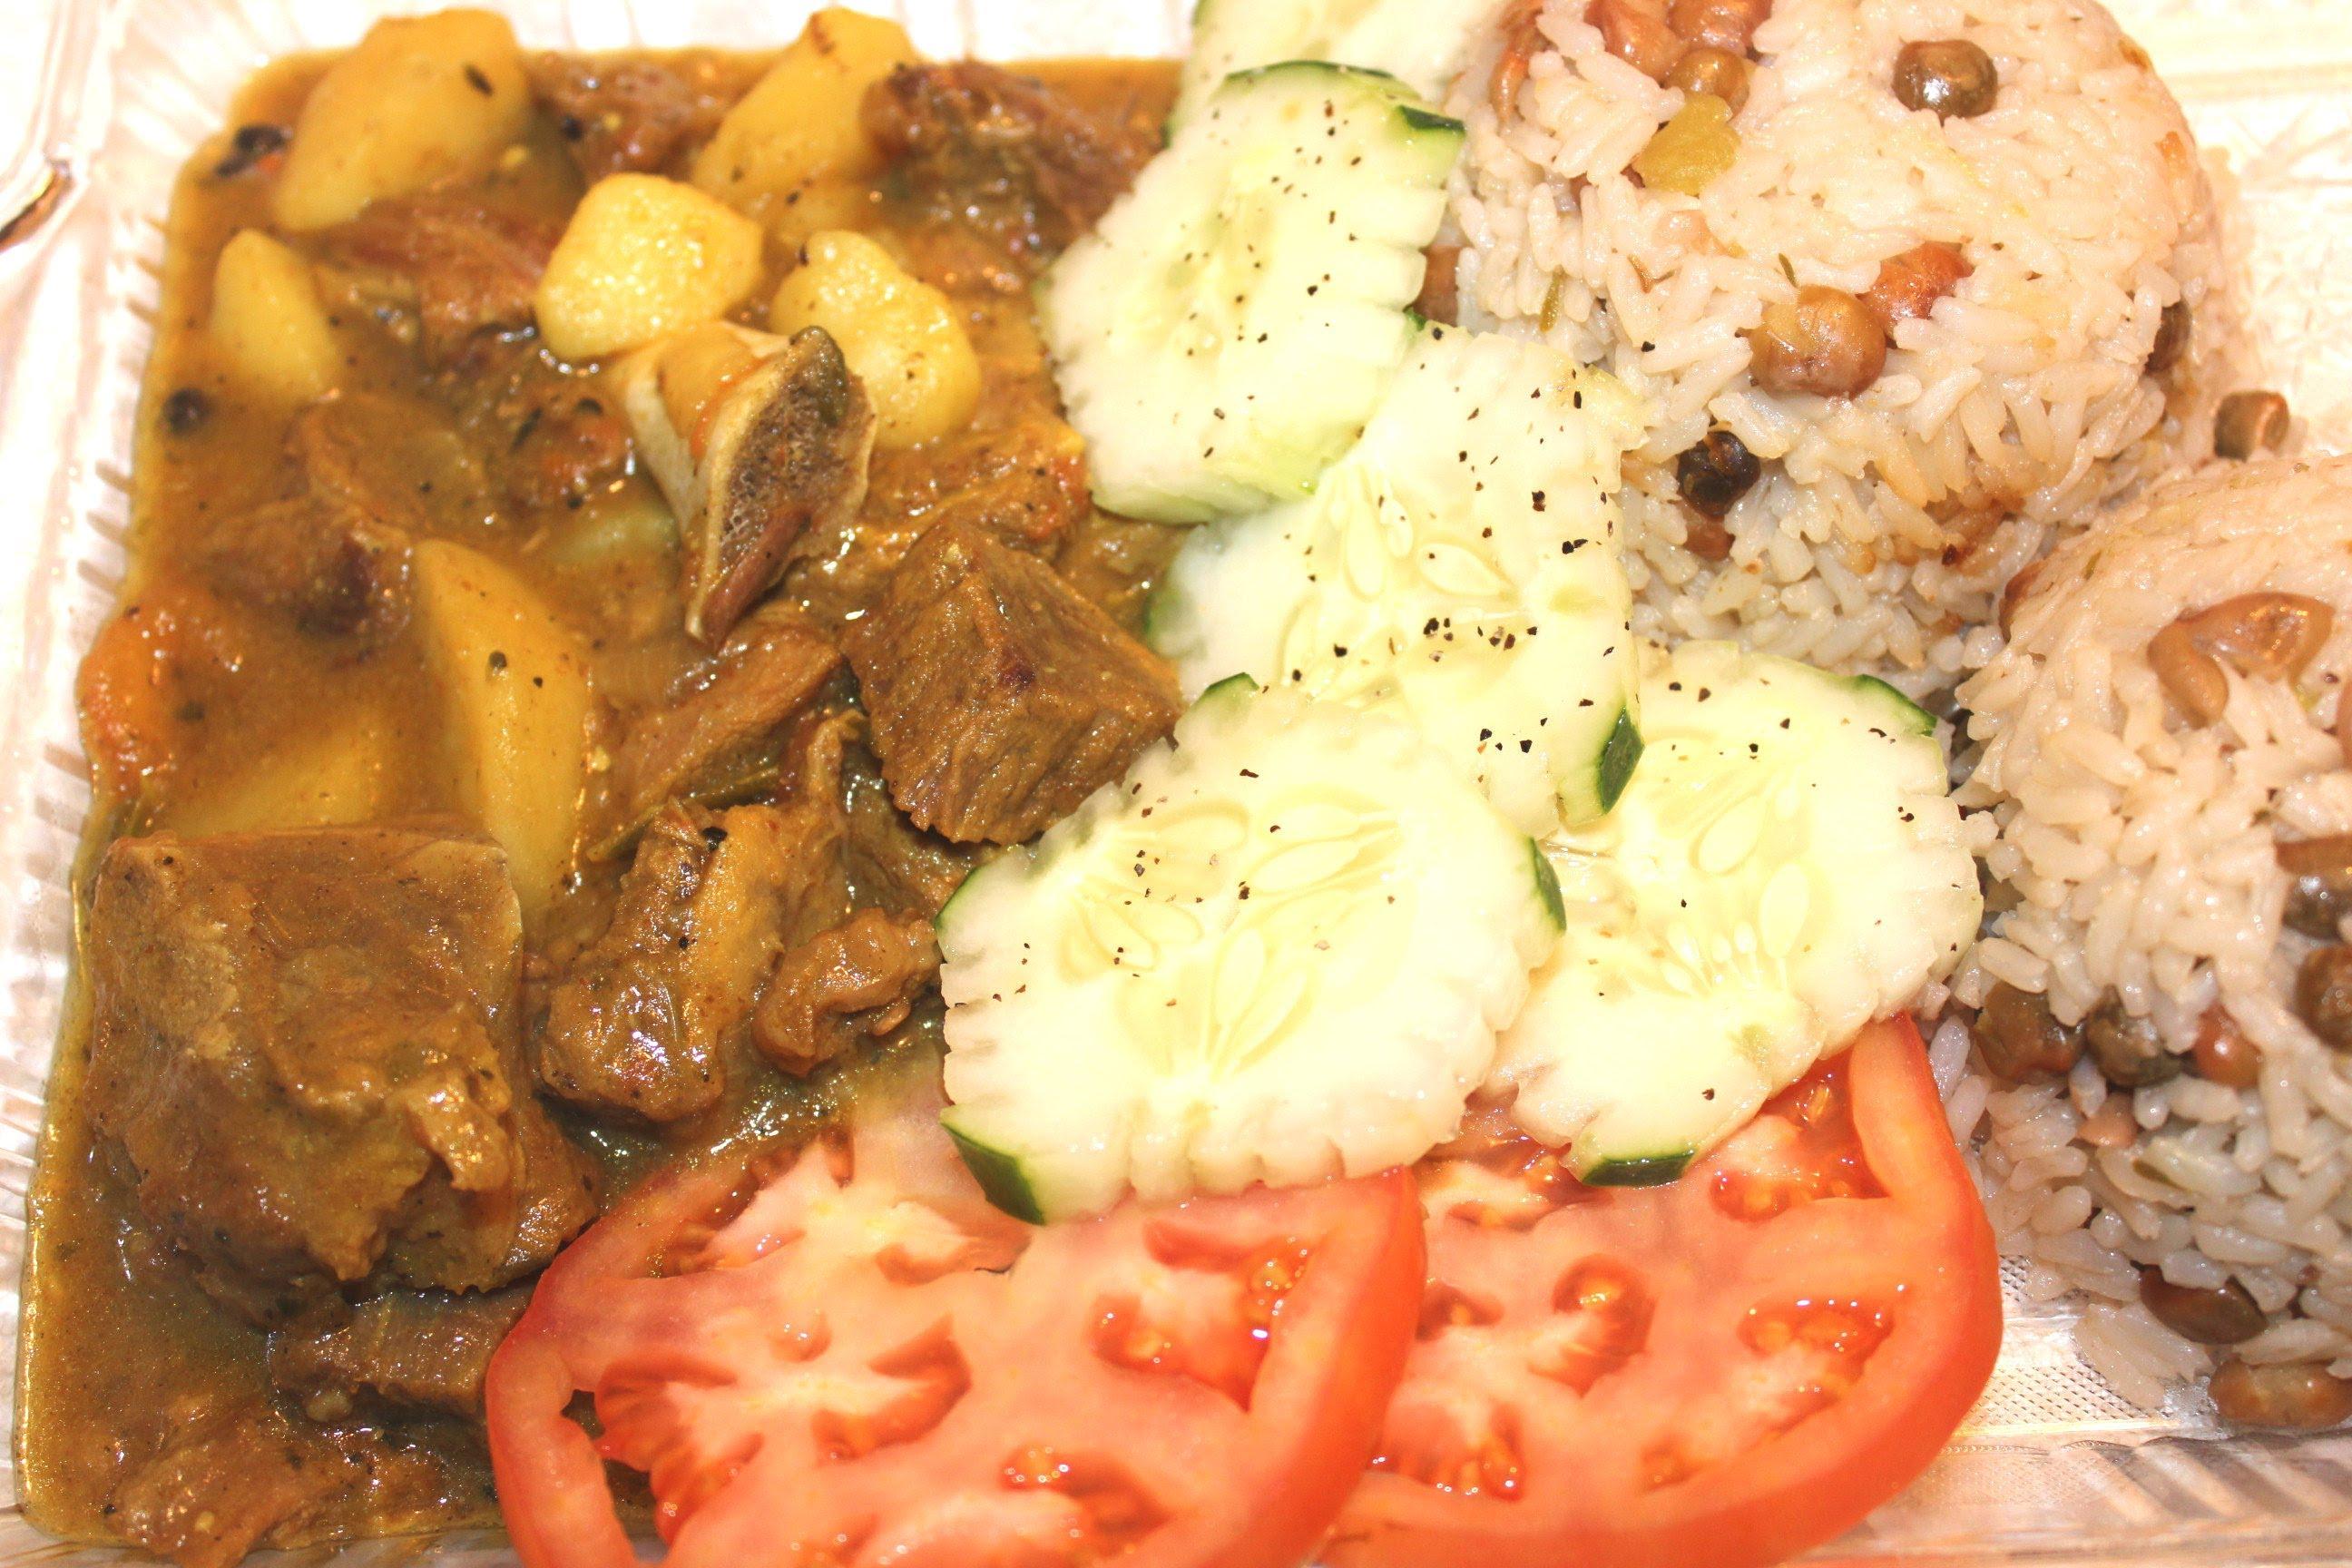 How to make jamaican coconut fried dumplings recipe 2015 jamaican how to make jamaican coconut fried dumplings recipe 2015 forumfinder Images